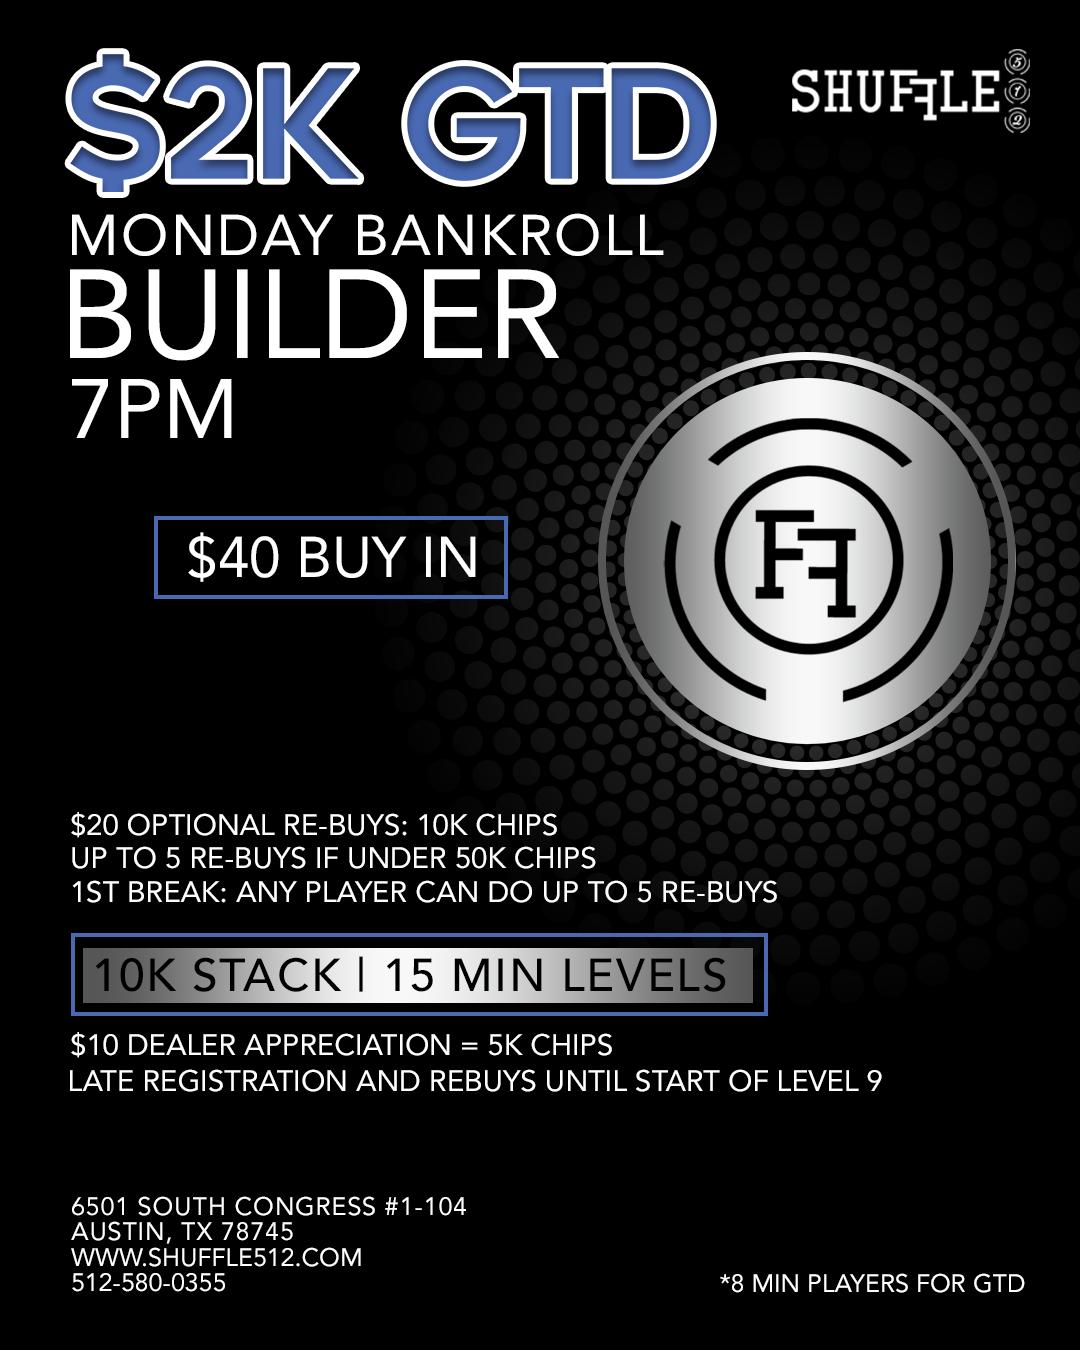 Shuffle 512 Monday 2K GTD Bankroll Builder